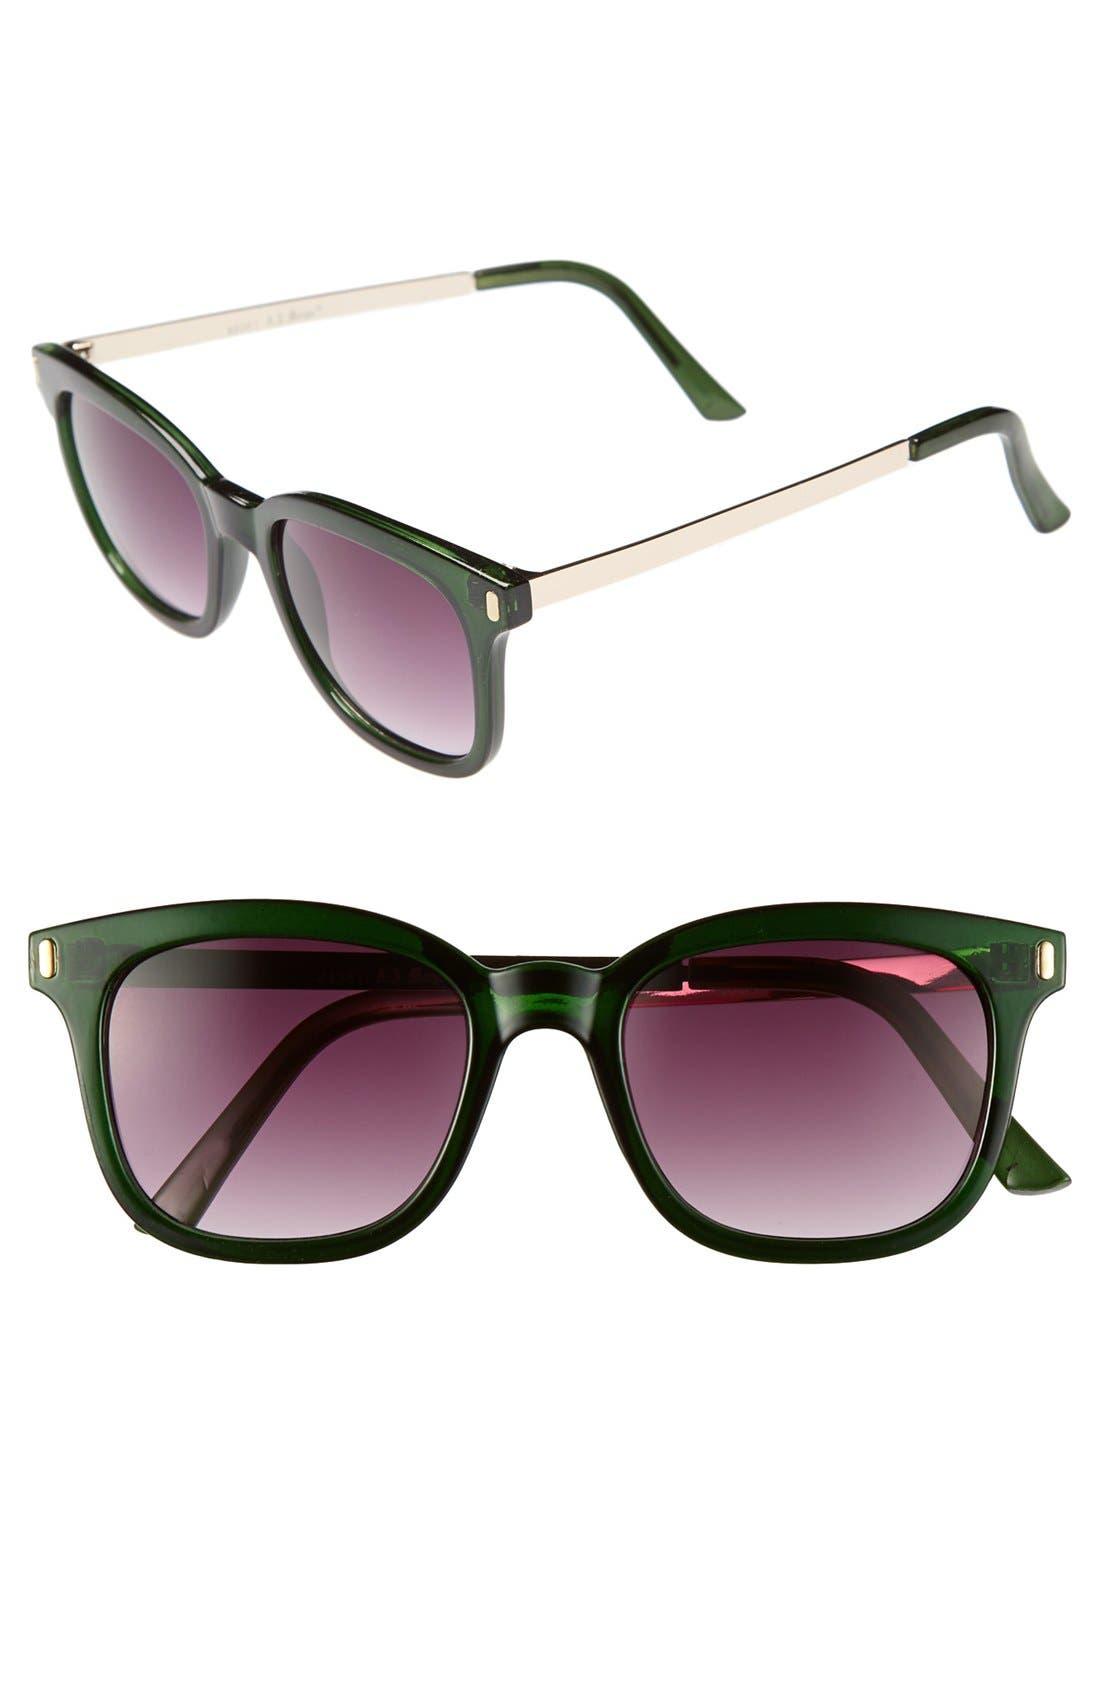 Main Image - A.J. Morgan 'Standard' Sunglasses